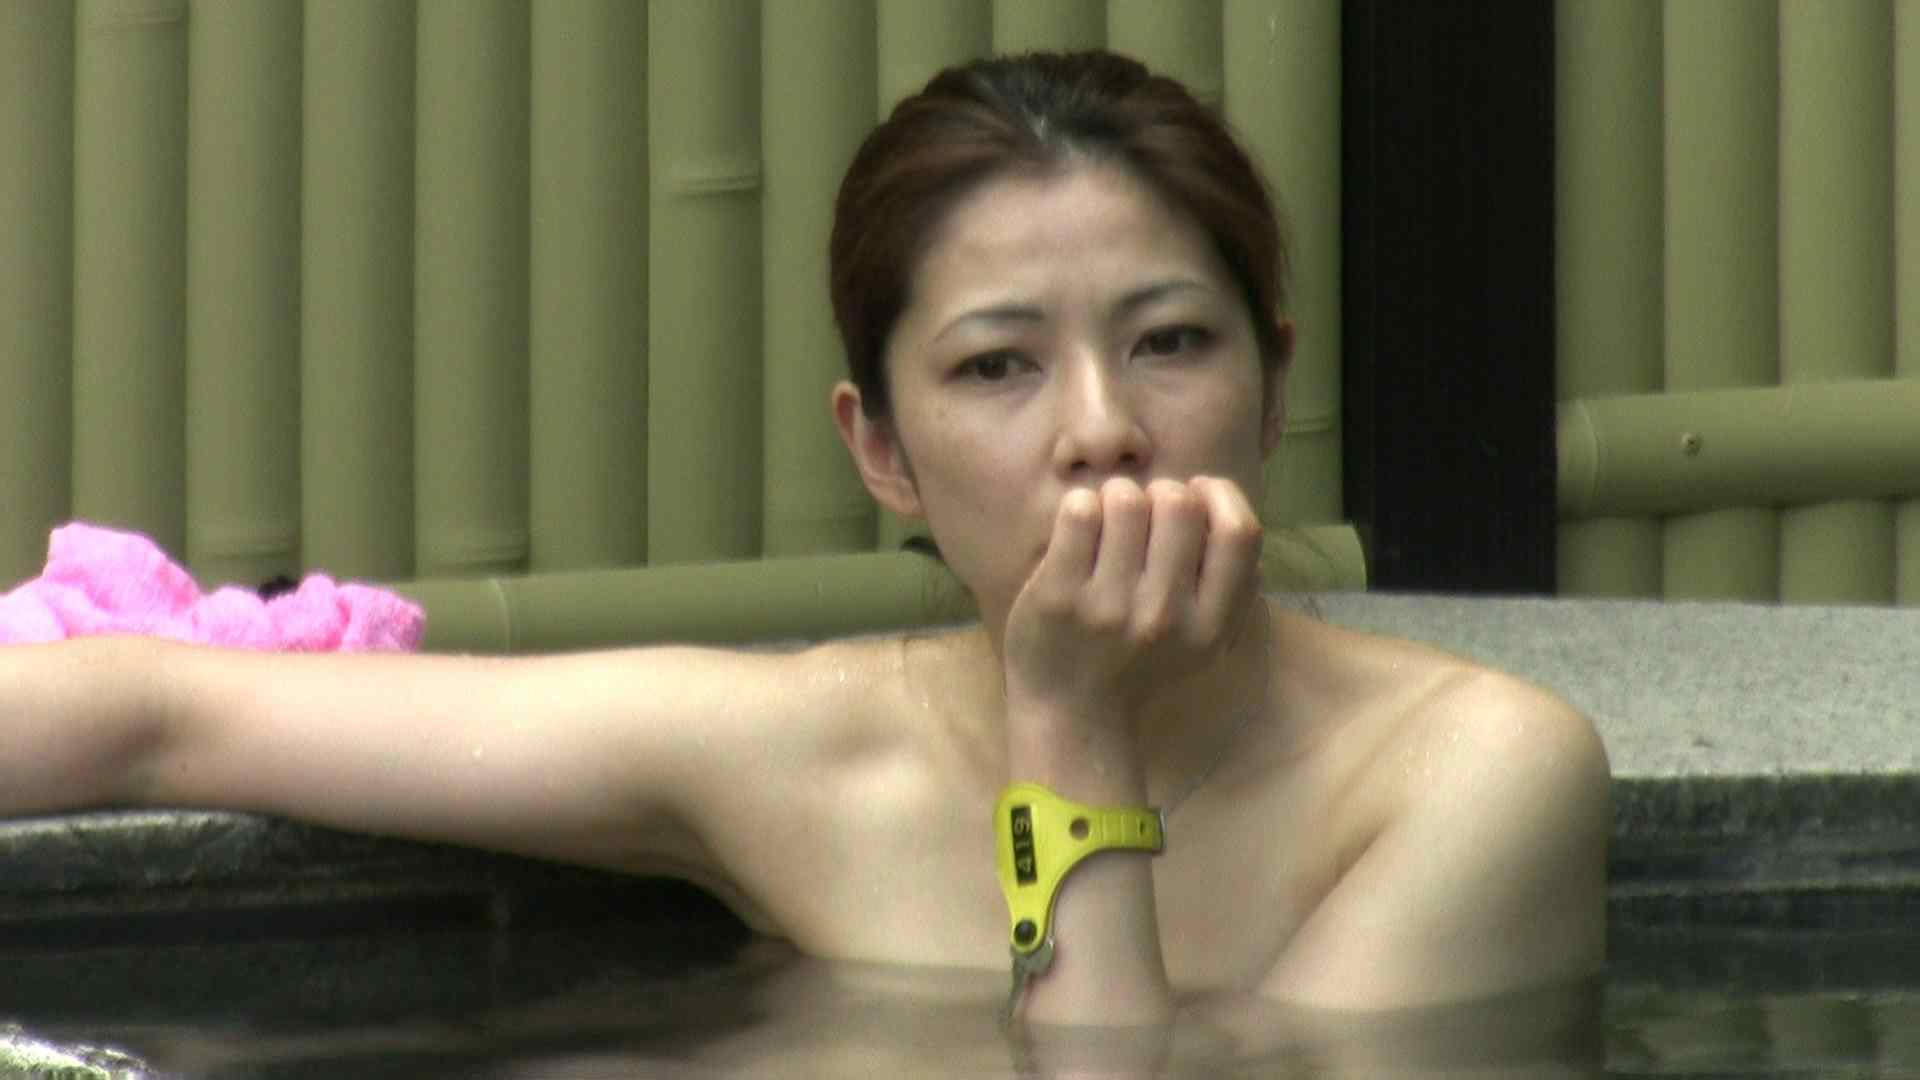 Aquaな露天風呂Vol.660 露天   OL女体  59連発 34